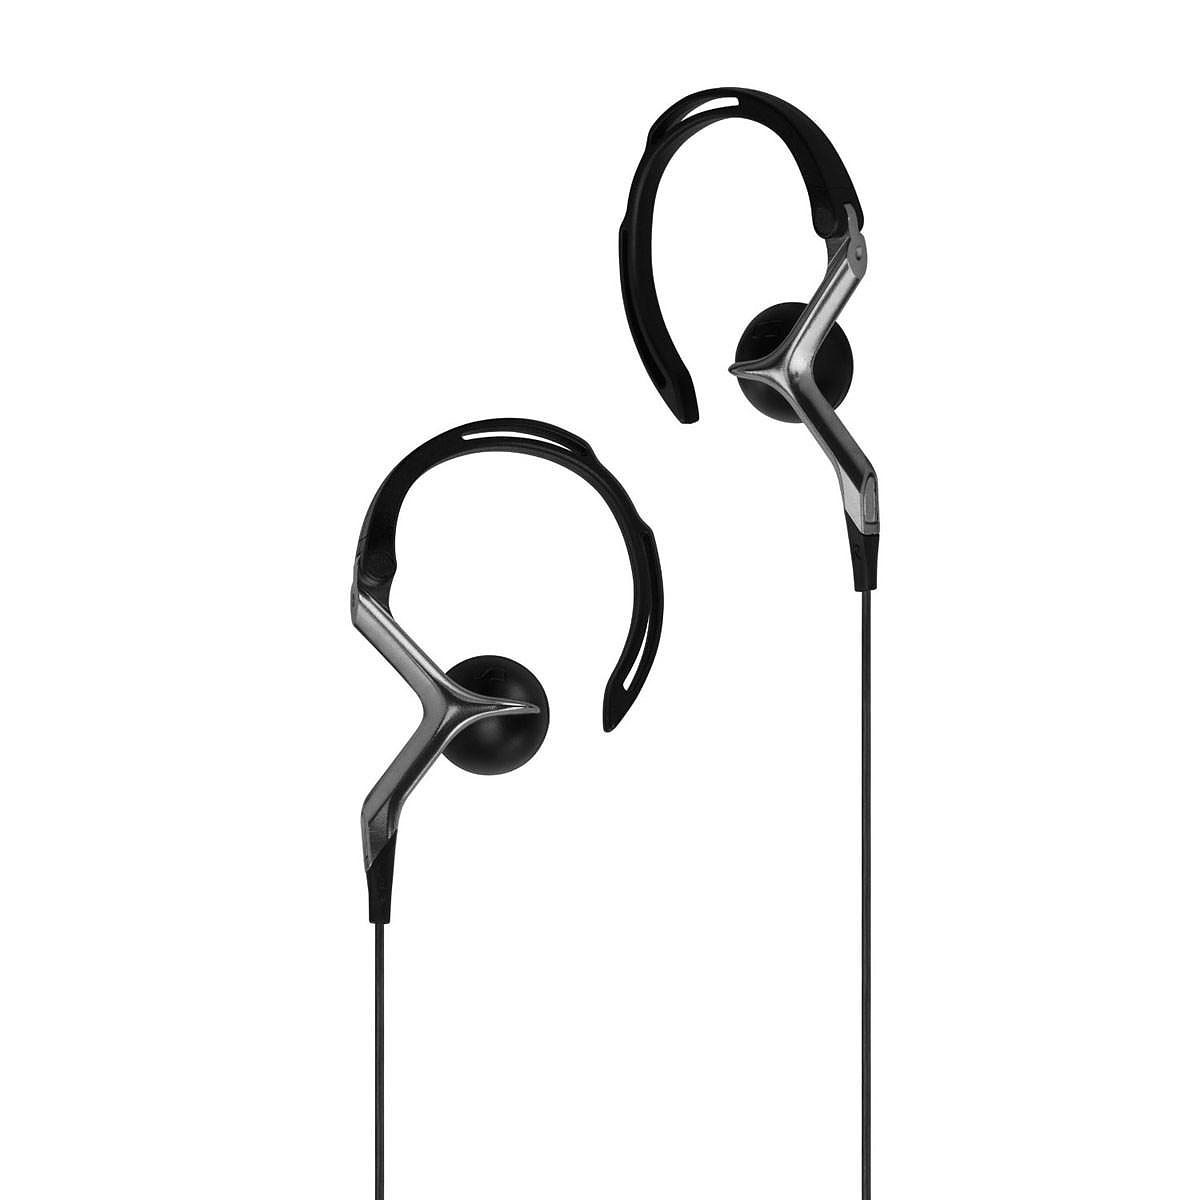 Sennheiser OMX 980 High Fidelity In-Ear Headphones by BMW DesignworksUSA.